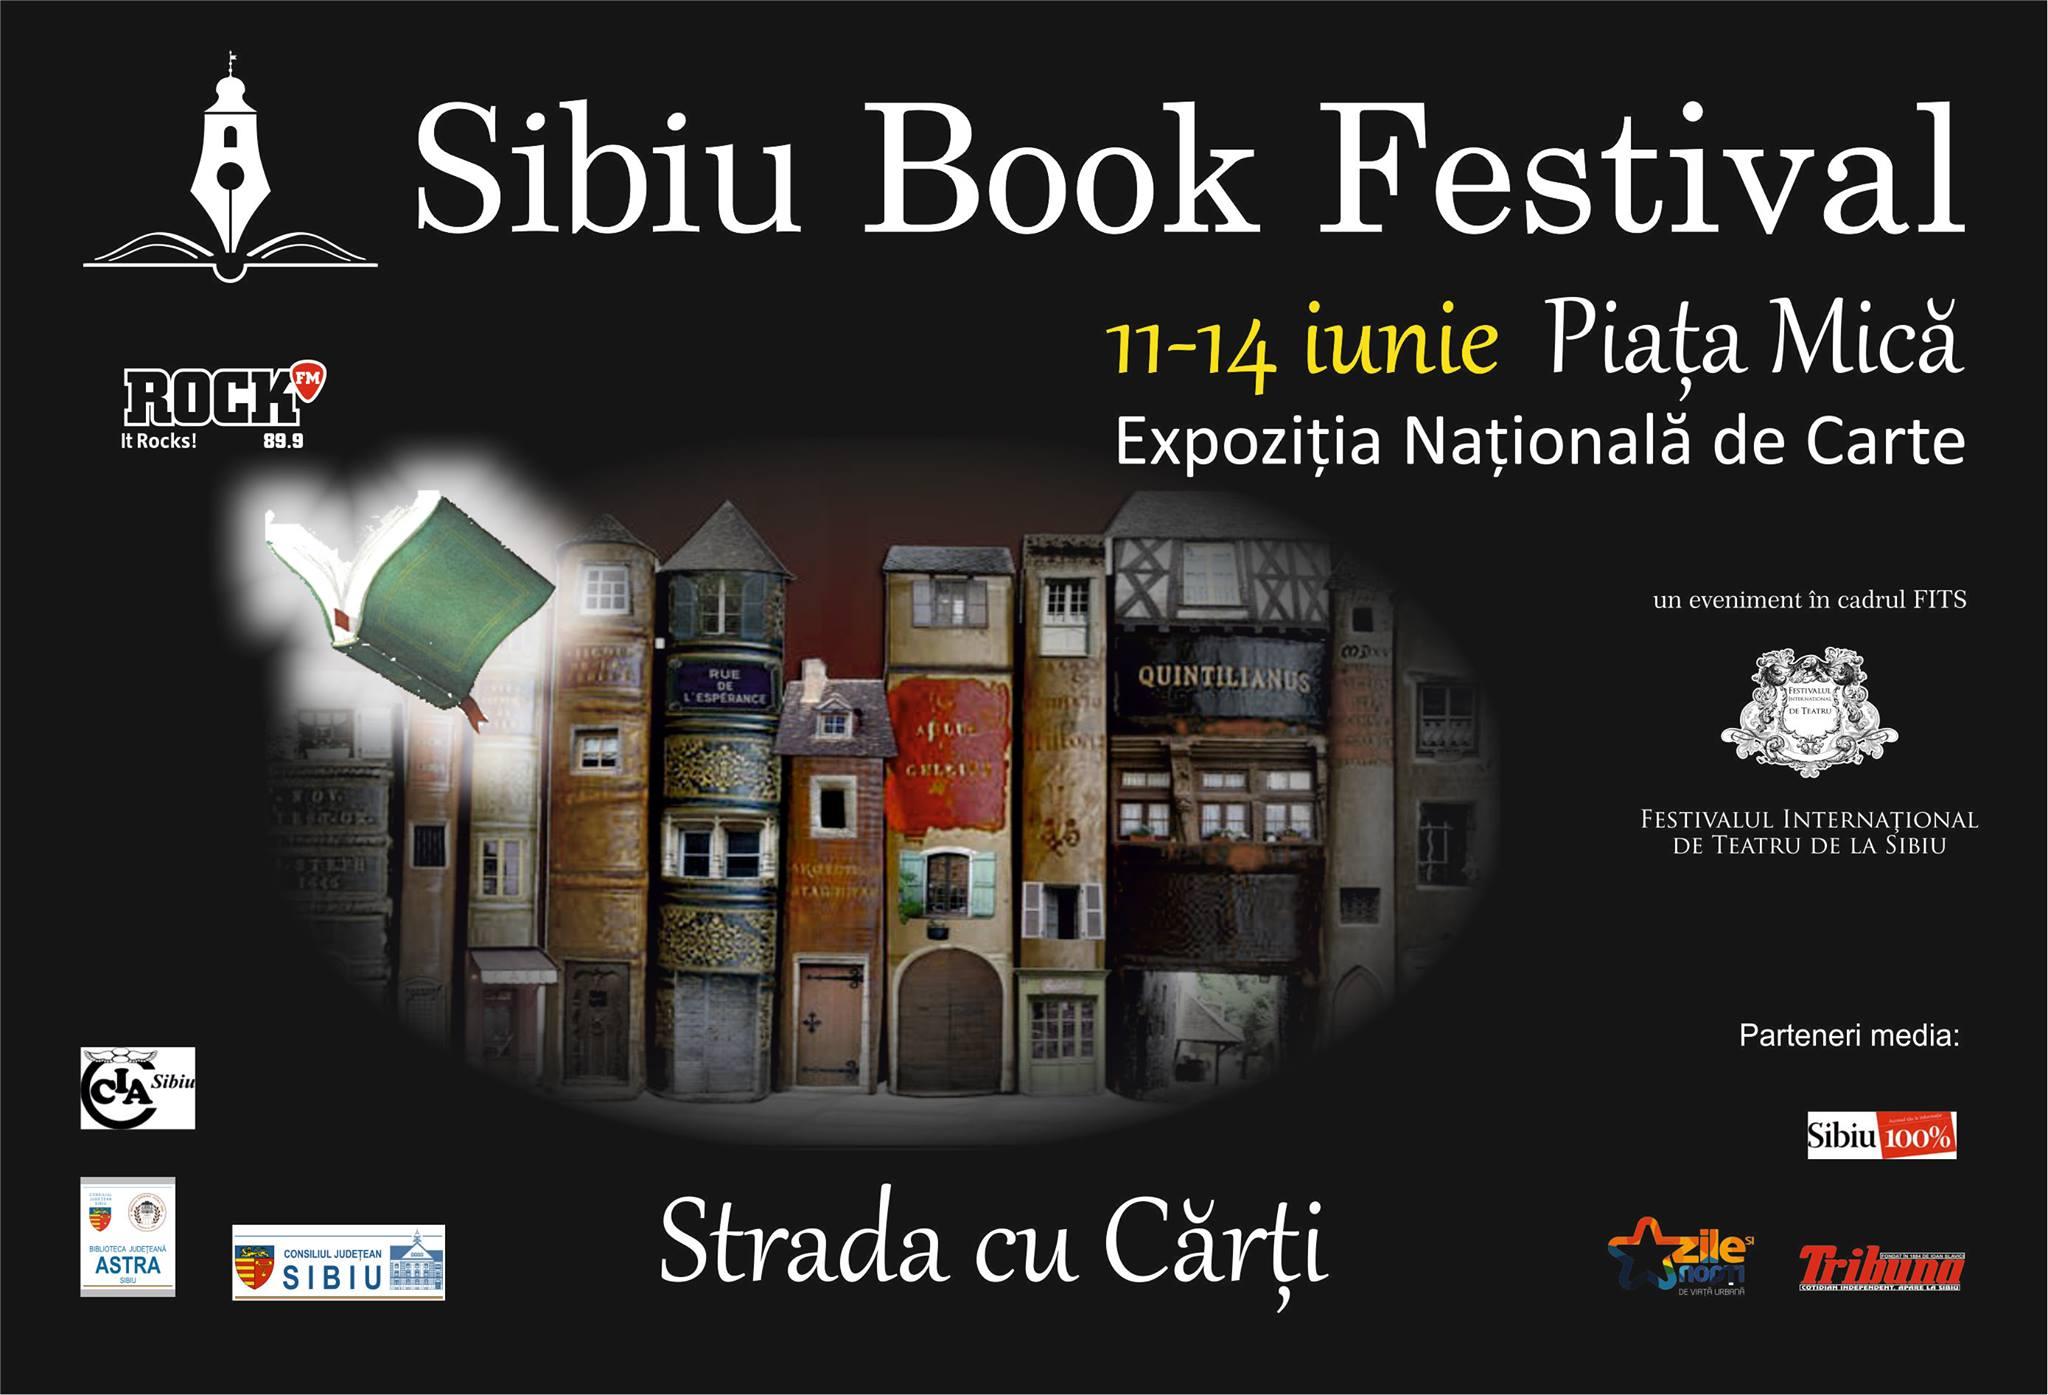 Sibiu Book Festival